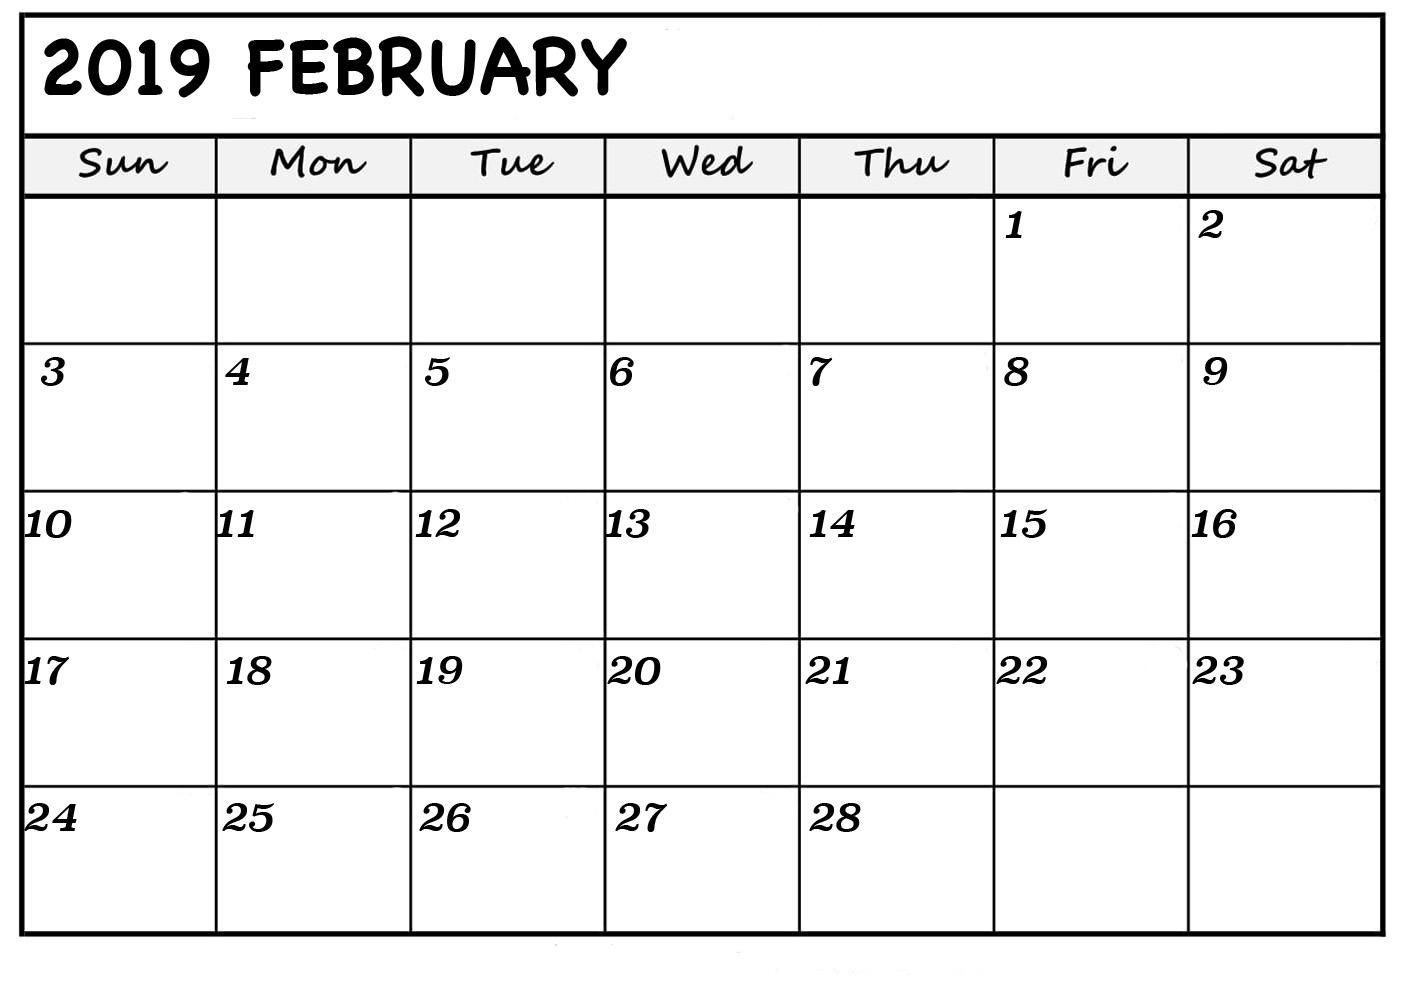 february 2019 template editable calendar download free december::February 2019 Calendar